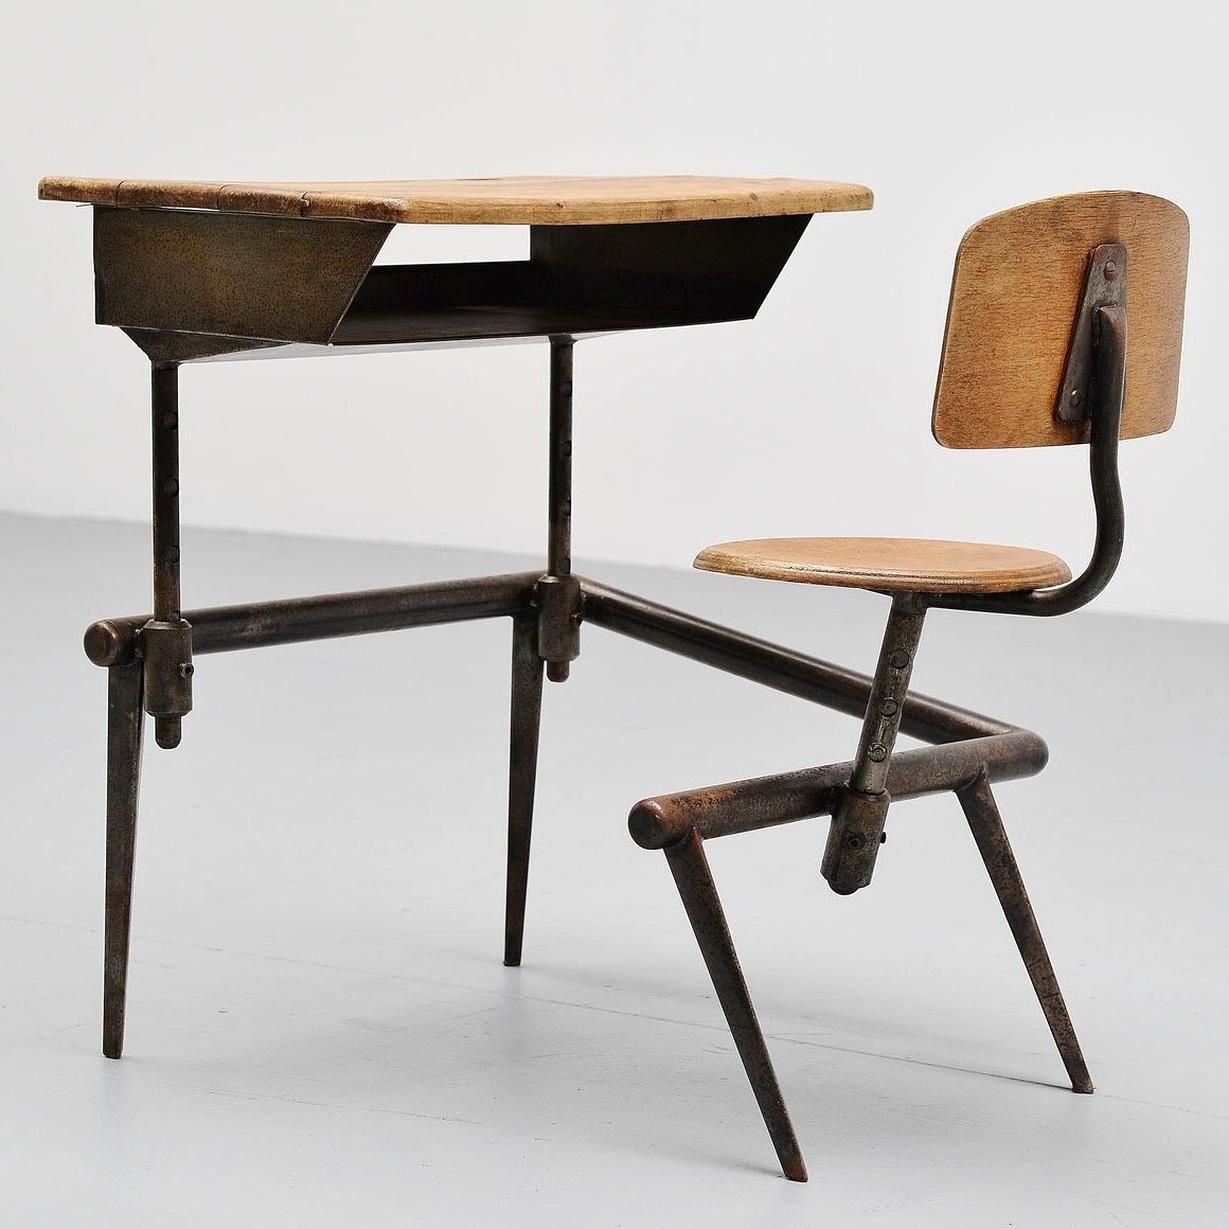 Jean Prouv School Desk Pupitre No 800 France 1952 Mid Mod Design In 2020 School Desks Prouve Design Desks